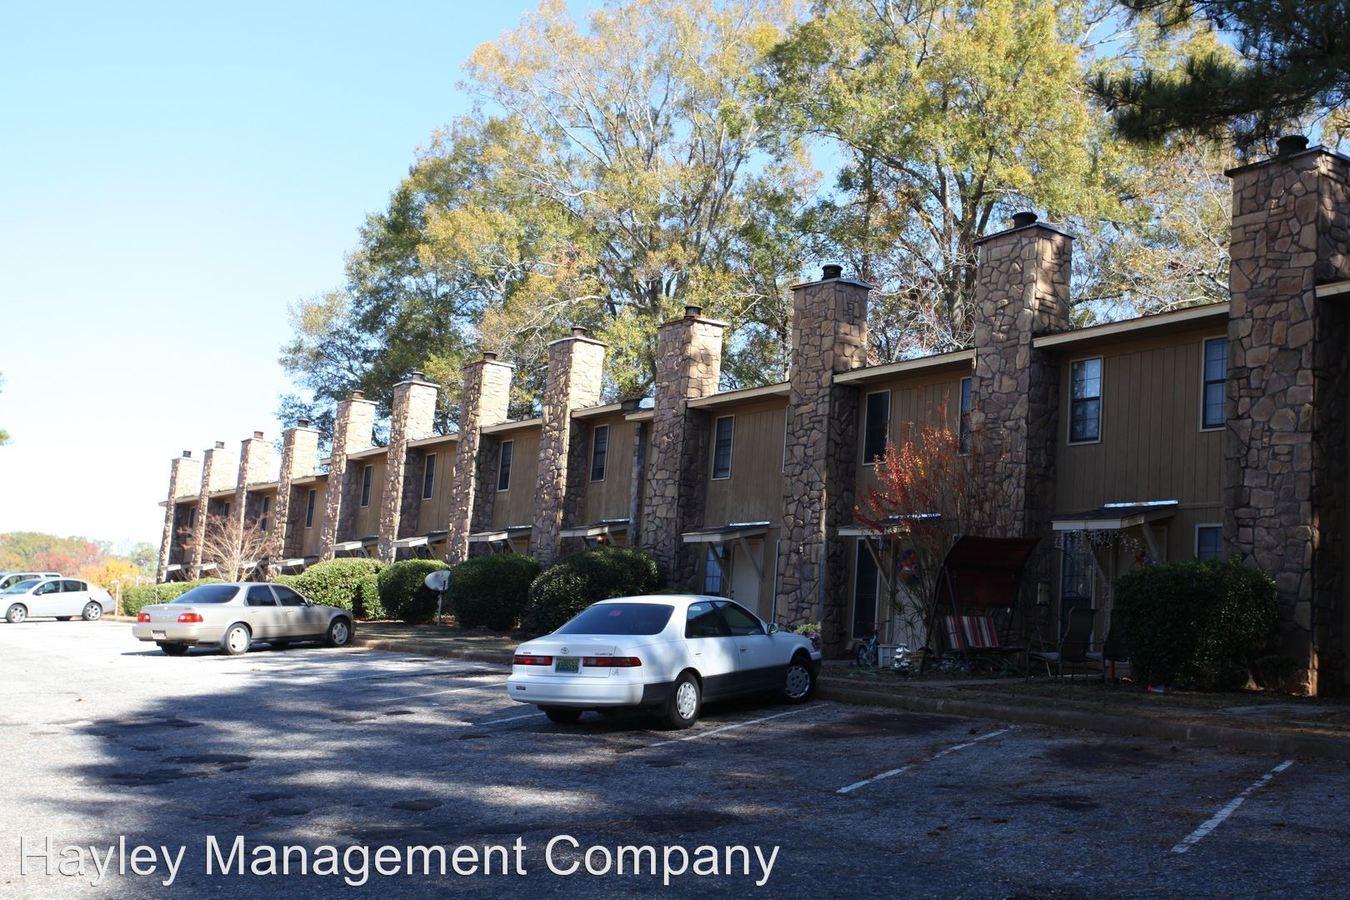 2 Bedrooms 1 Bathroom Apartment for rent at 1107/1108 Elliott Avenue in Opelika, AL